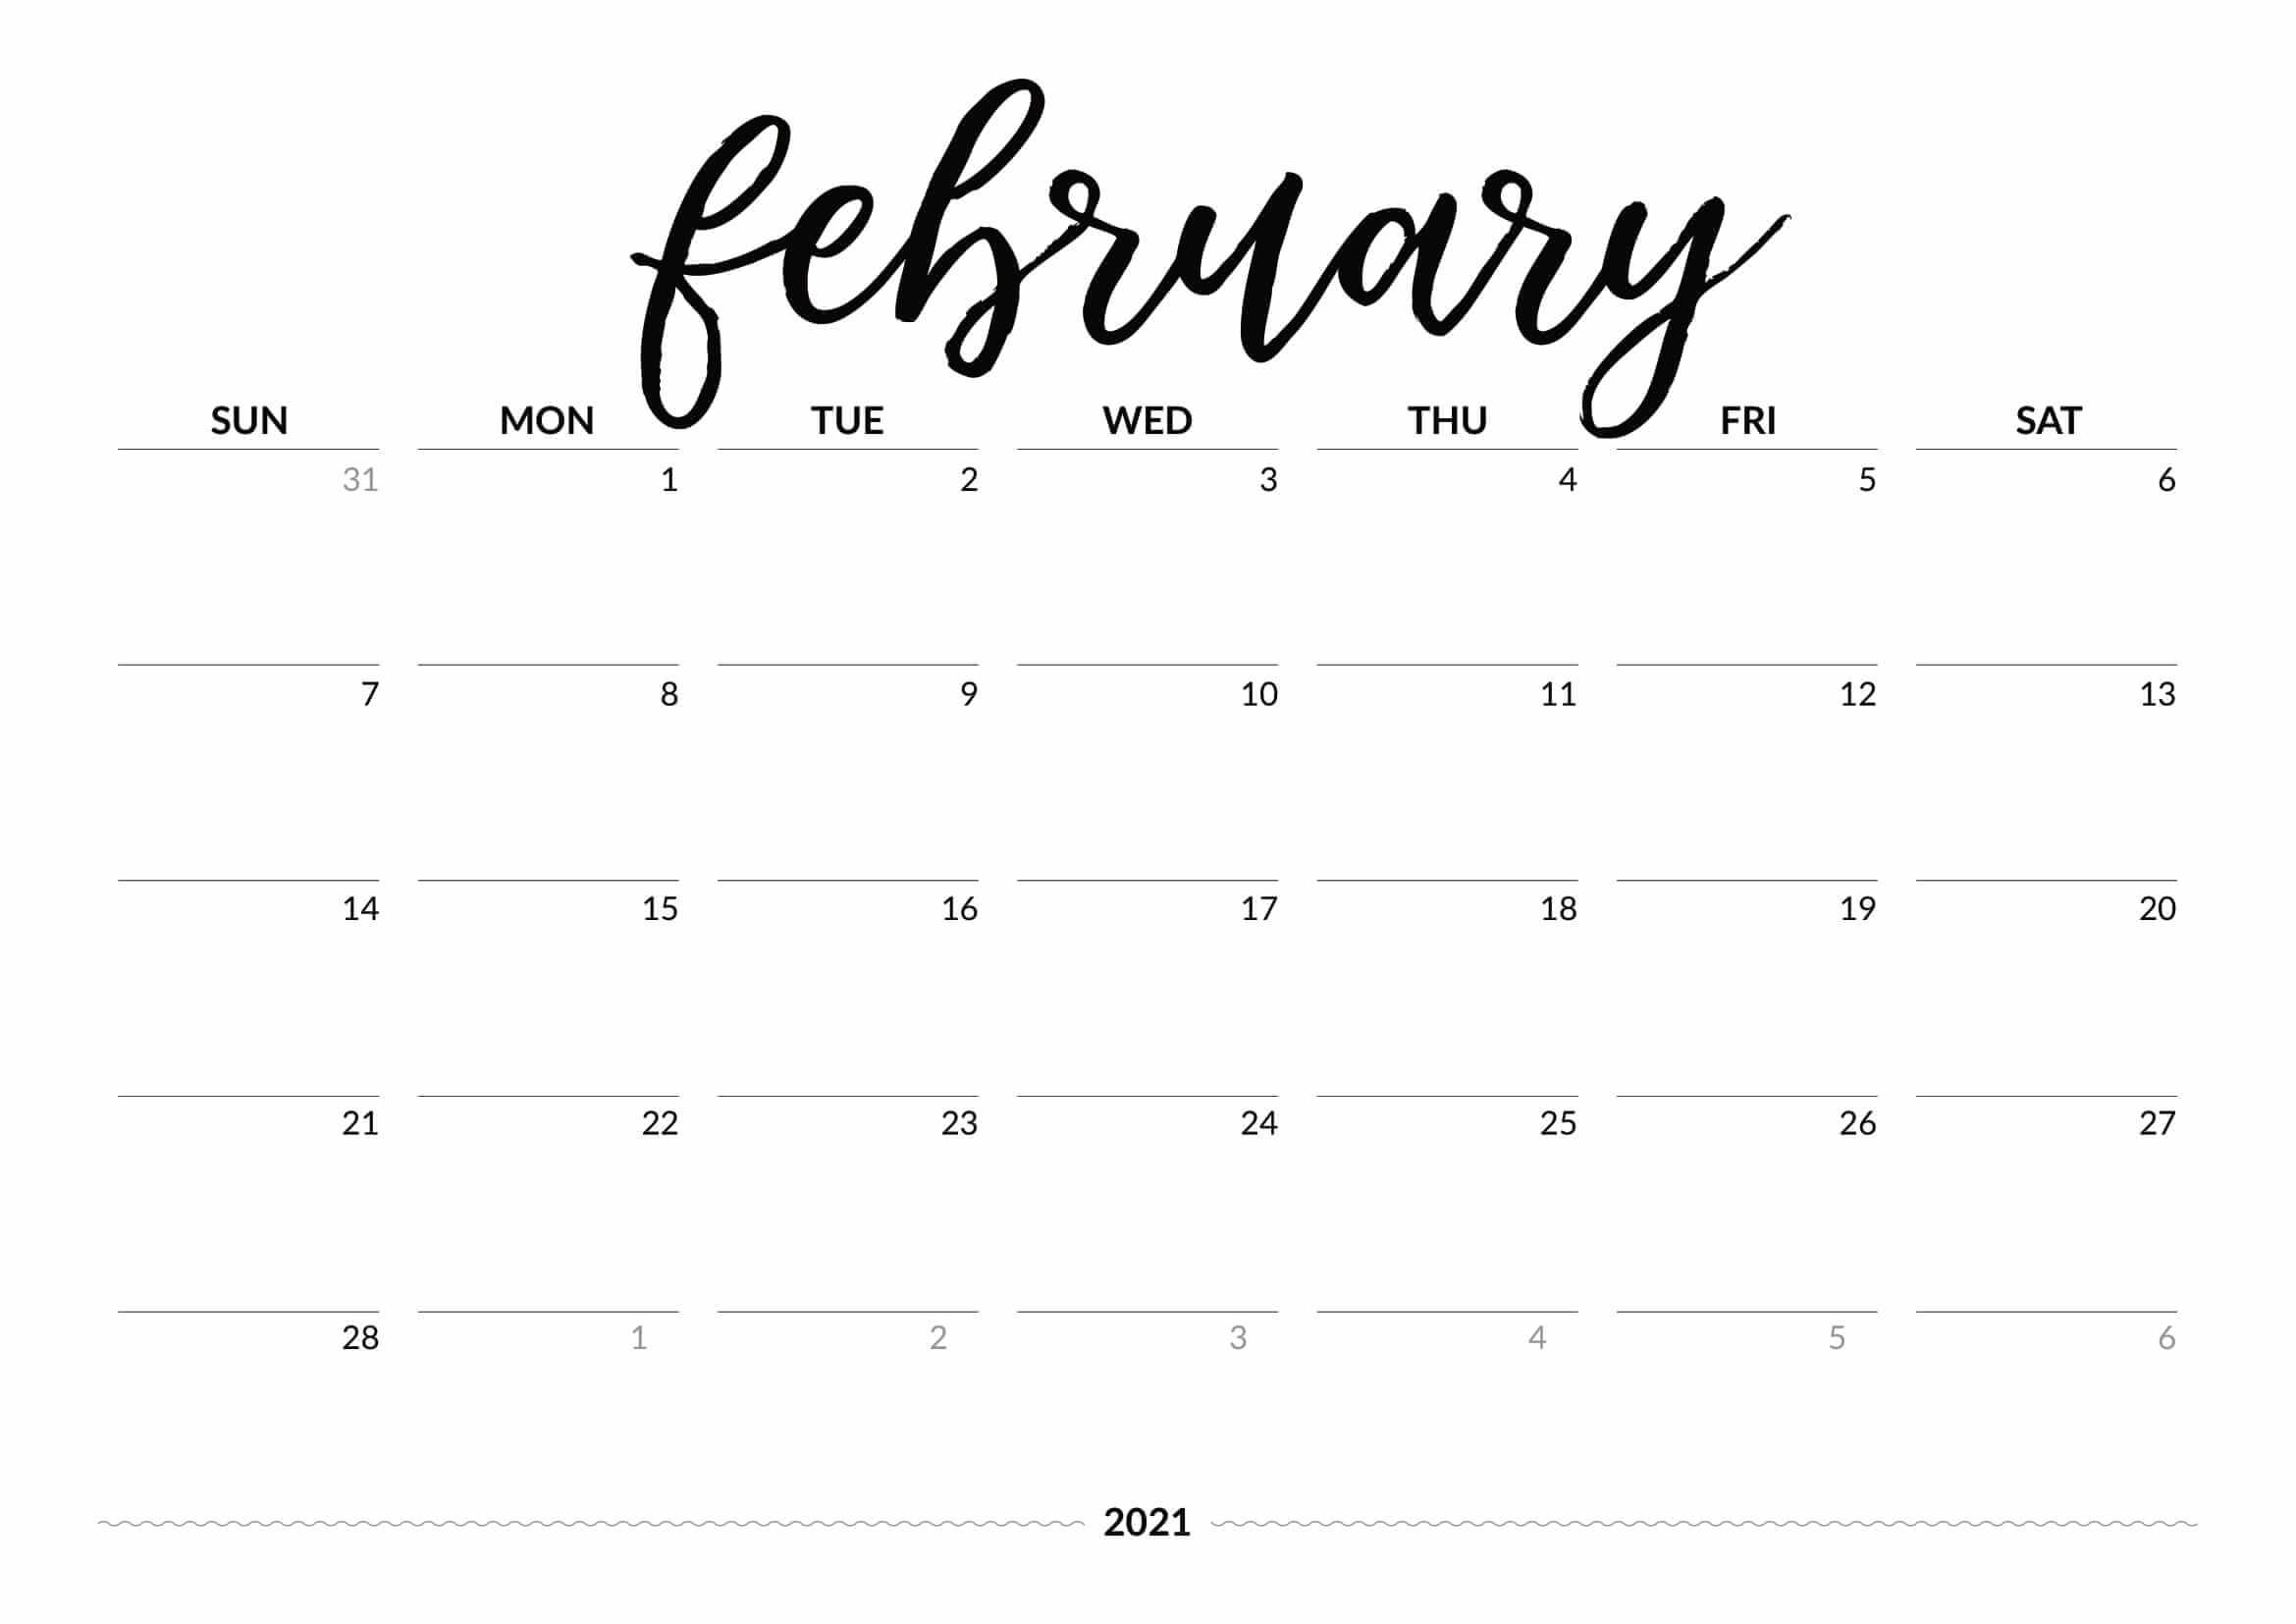 Printable February 2021 Calendar Desk & Wall - Time